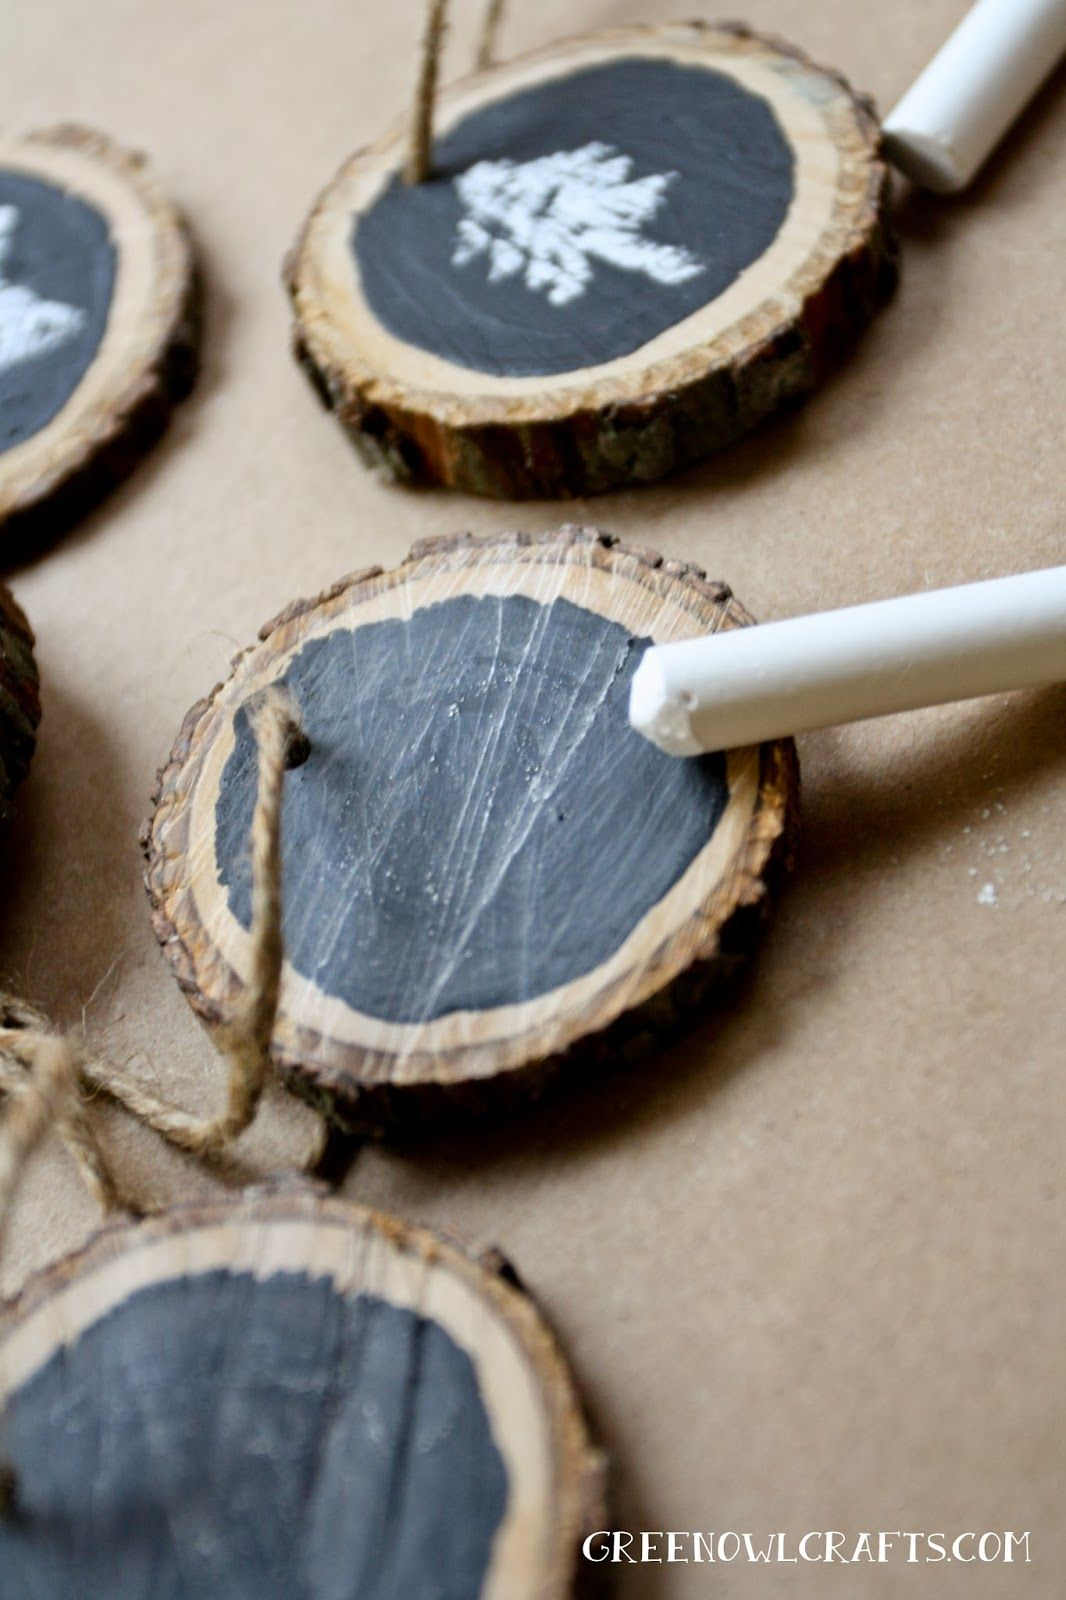 Green owl crafts diy wood medallion chalkboard christmas ornament